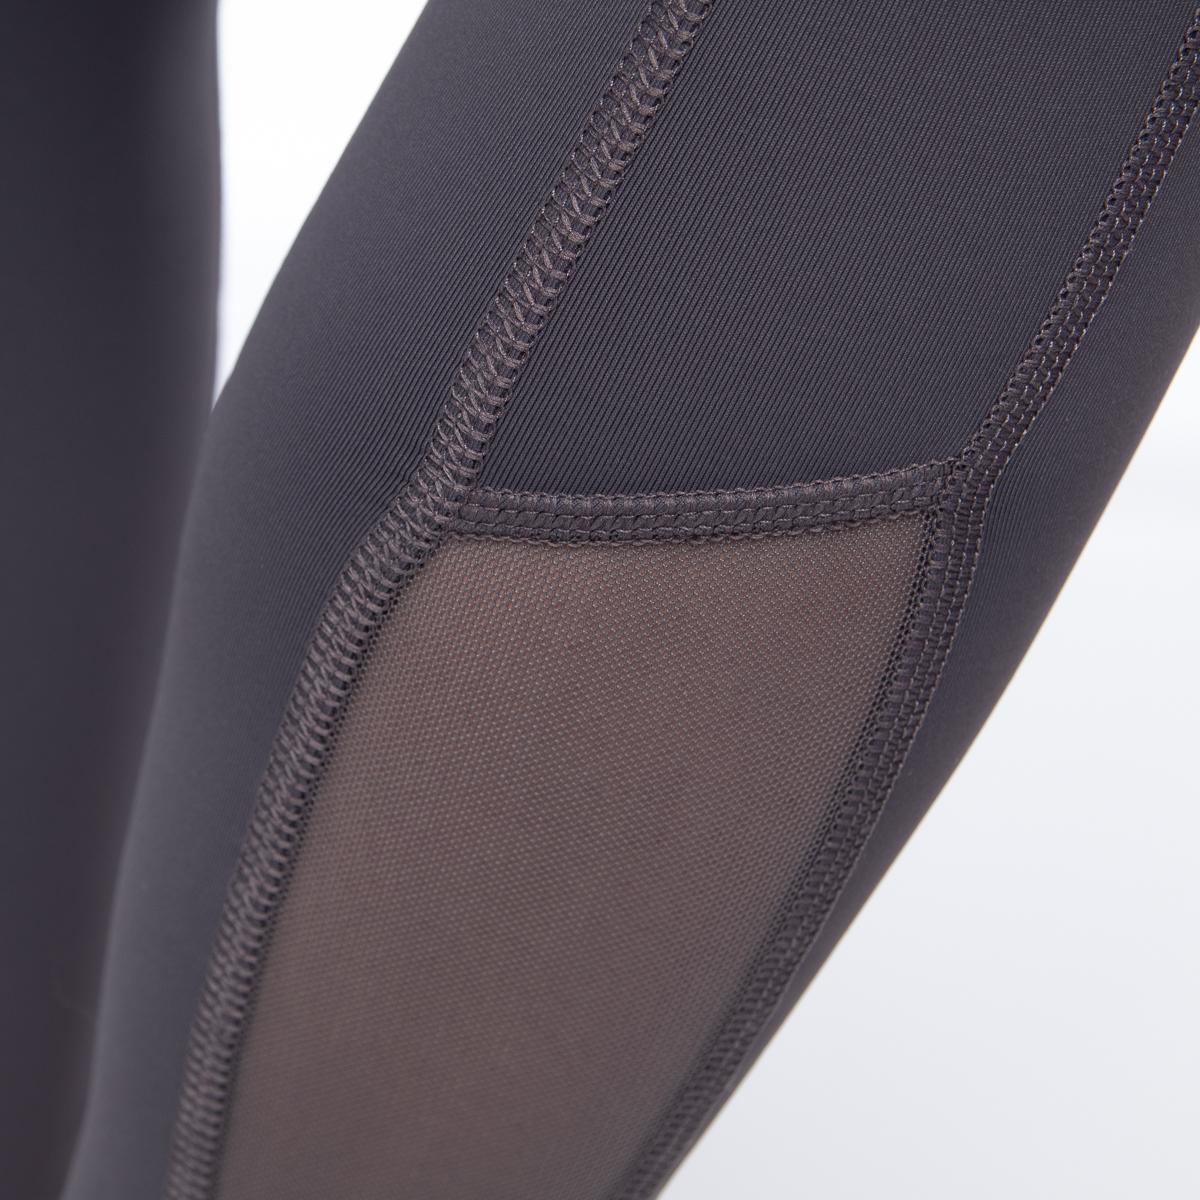 7-8-Length-High-Waist-Moisture-Wicking-UPF-50-Leggings-Run-Gym-Yoga-Pants-Mesh thumbnail 11